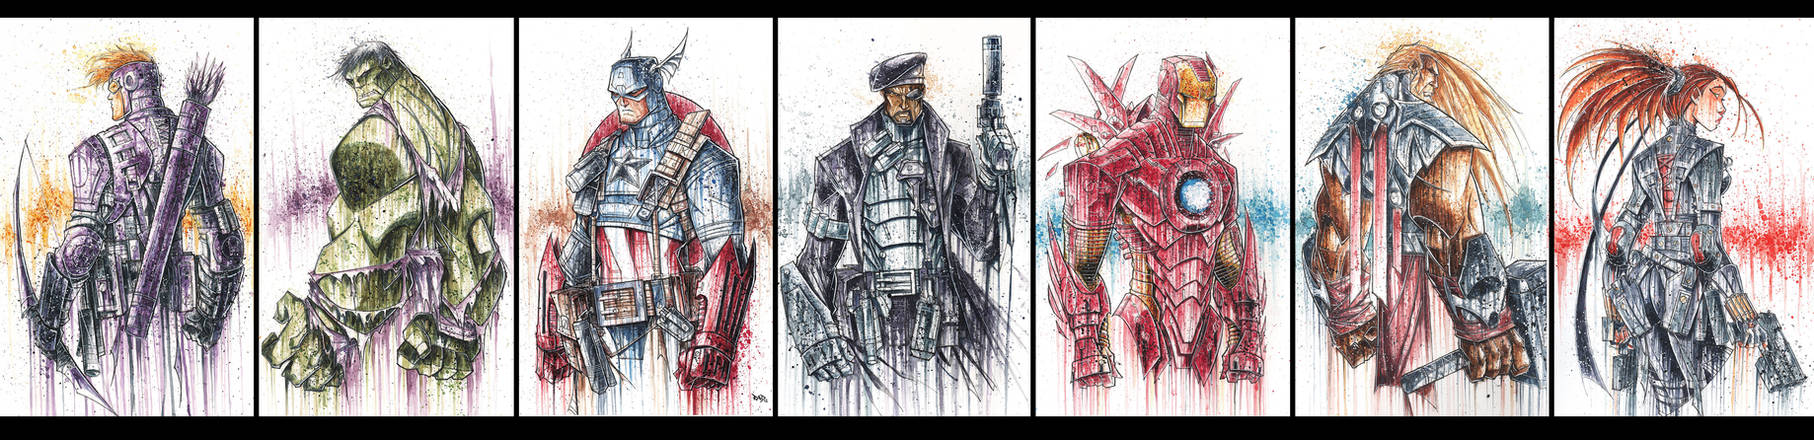 Avengers 'Saucy' Prints FINAL